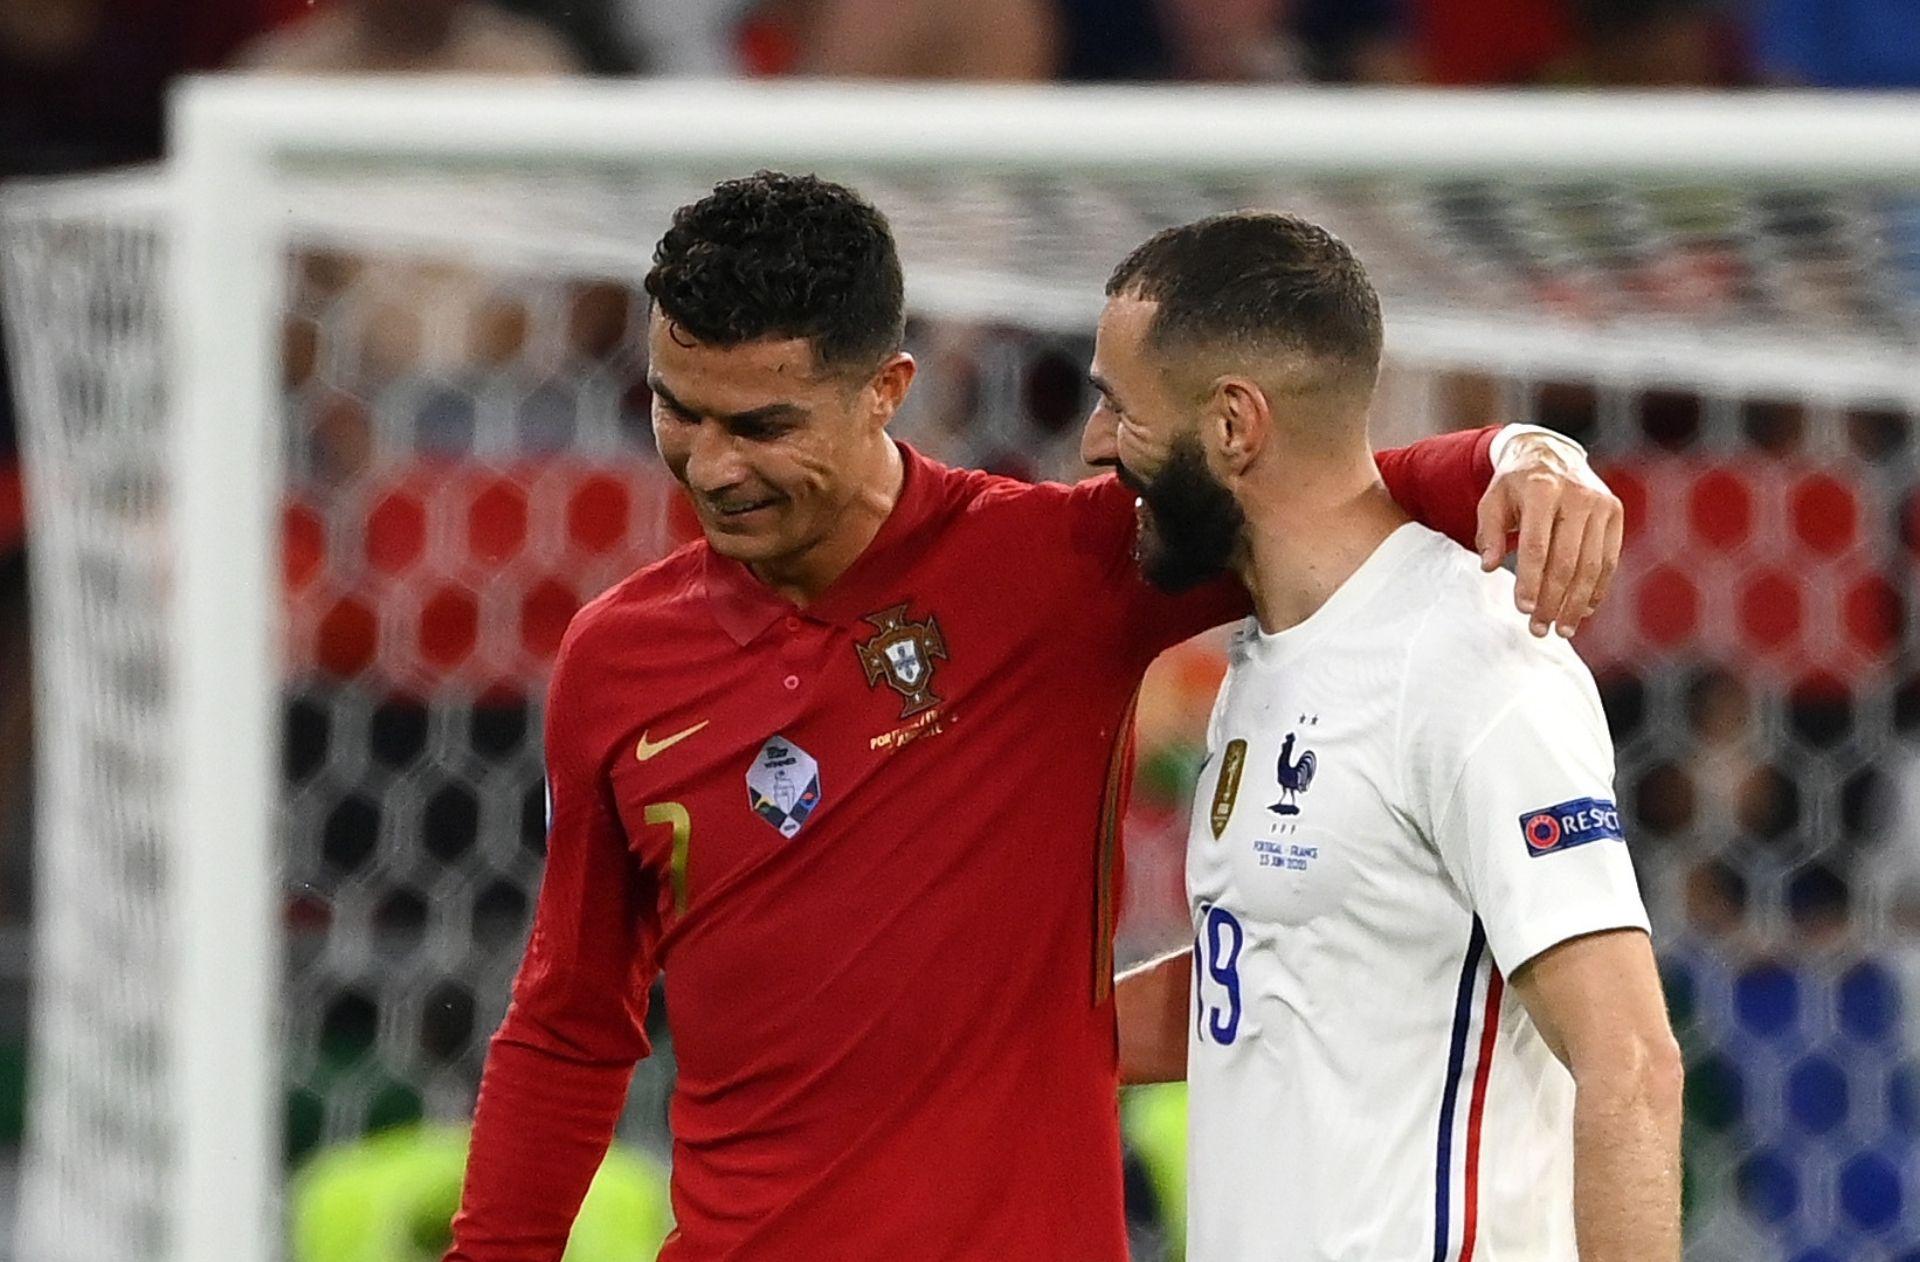 Cristiano Ronaldo & Karim Benzema - Portugal vs France